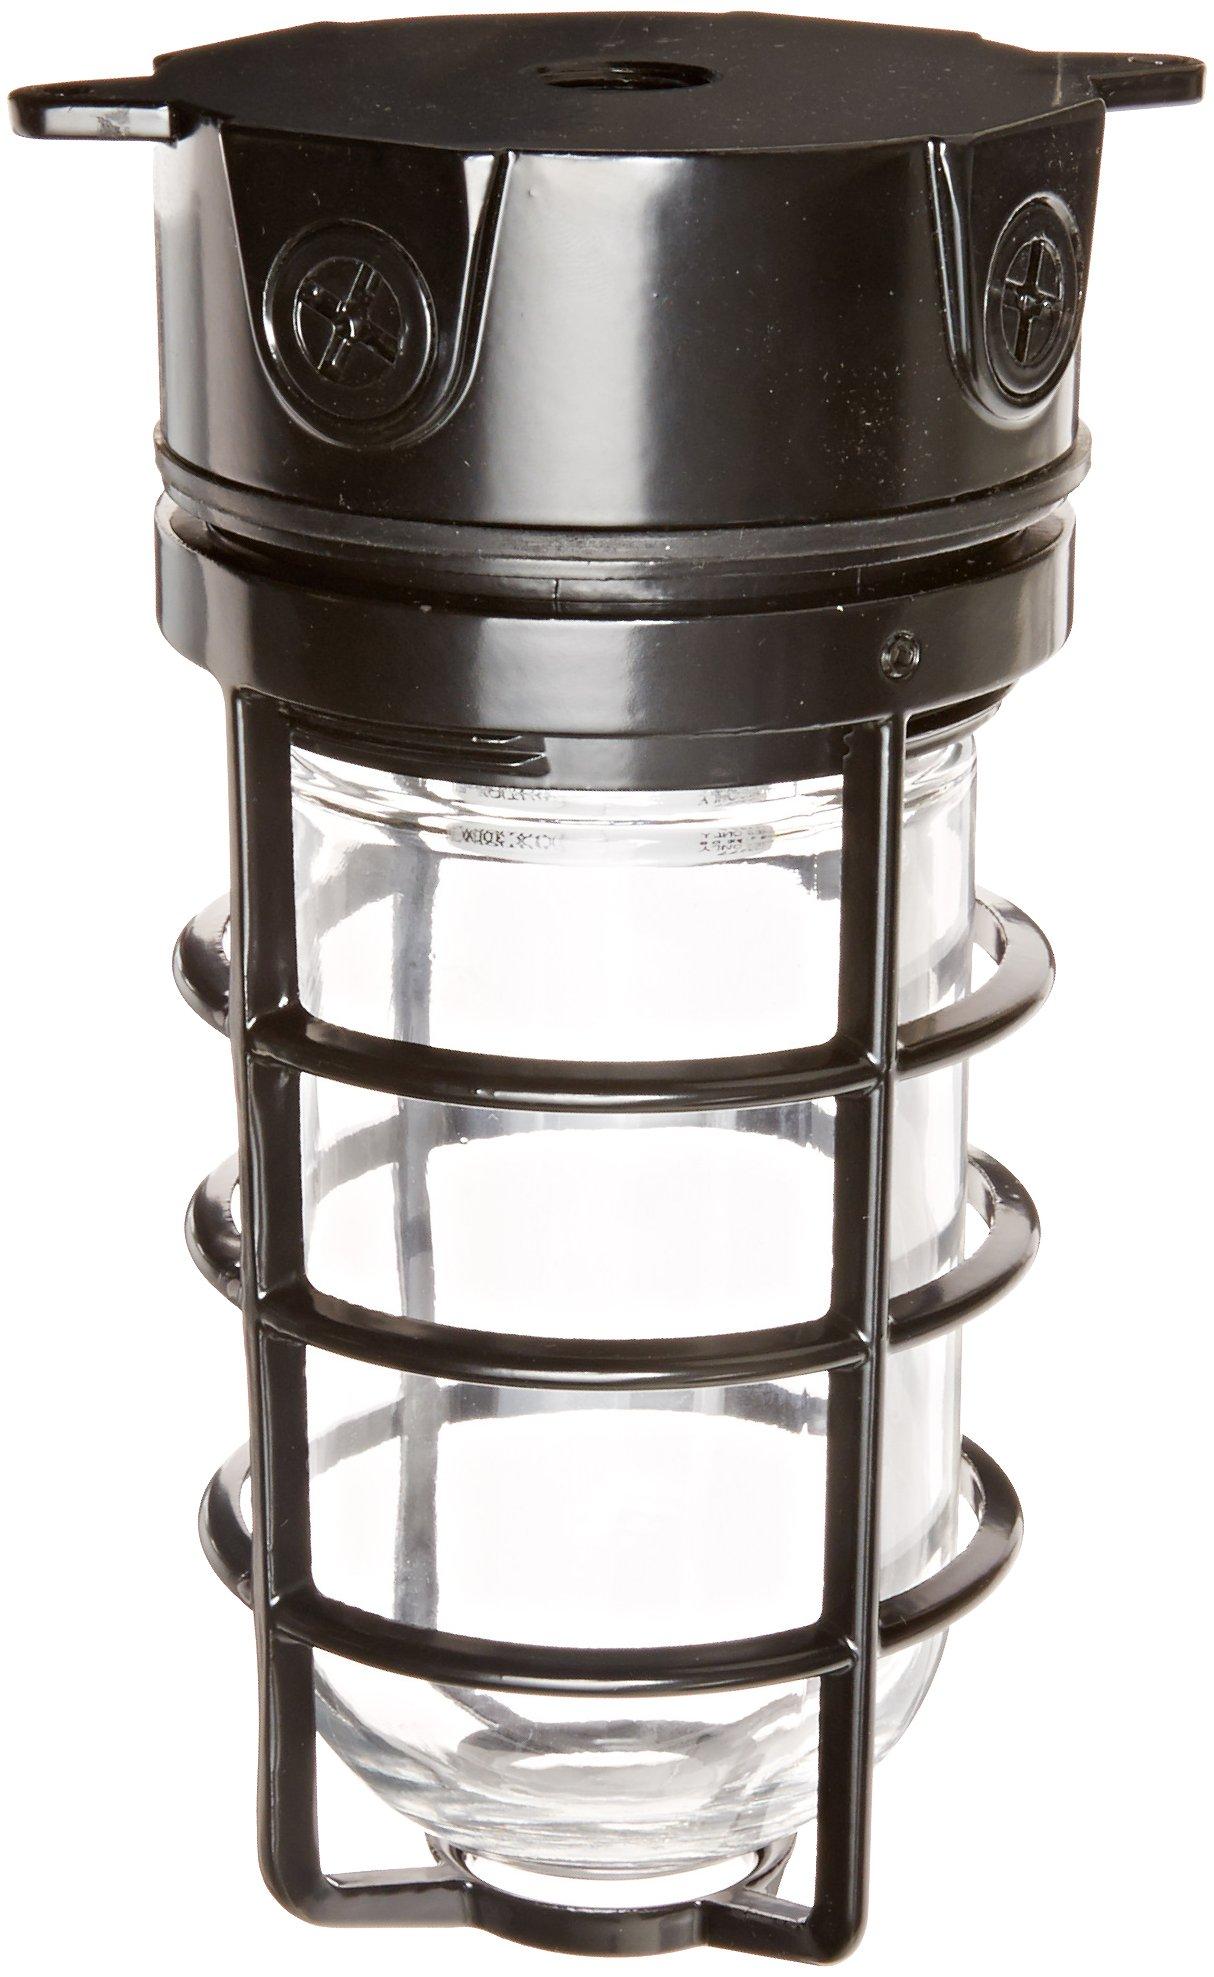 RAB Lighting VX100DGB Vaporproof VX 4'' Ceiling Box Mount with Glass Globe and Cast Guard, A19 Type, Aluminum, 150W Power, 1/2'' Hub, Black